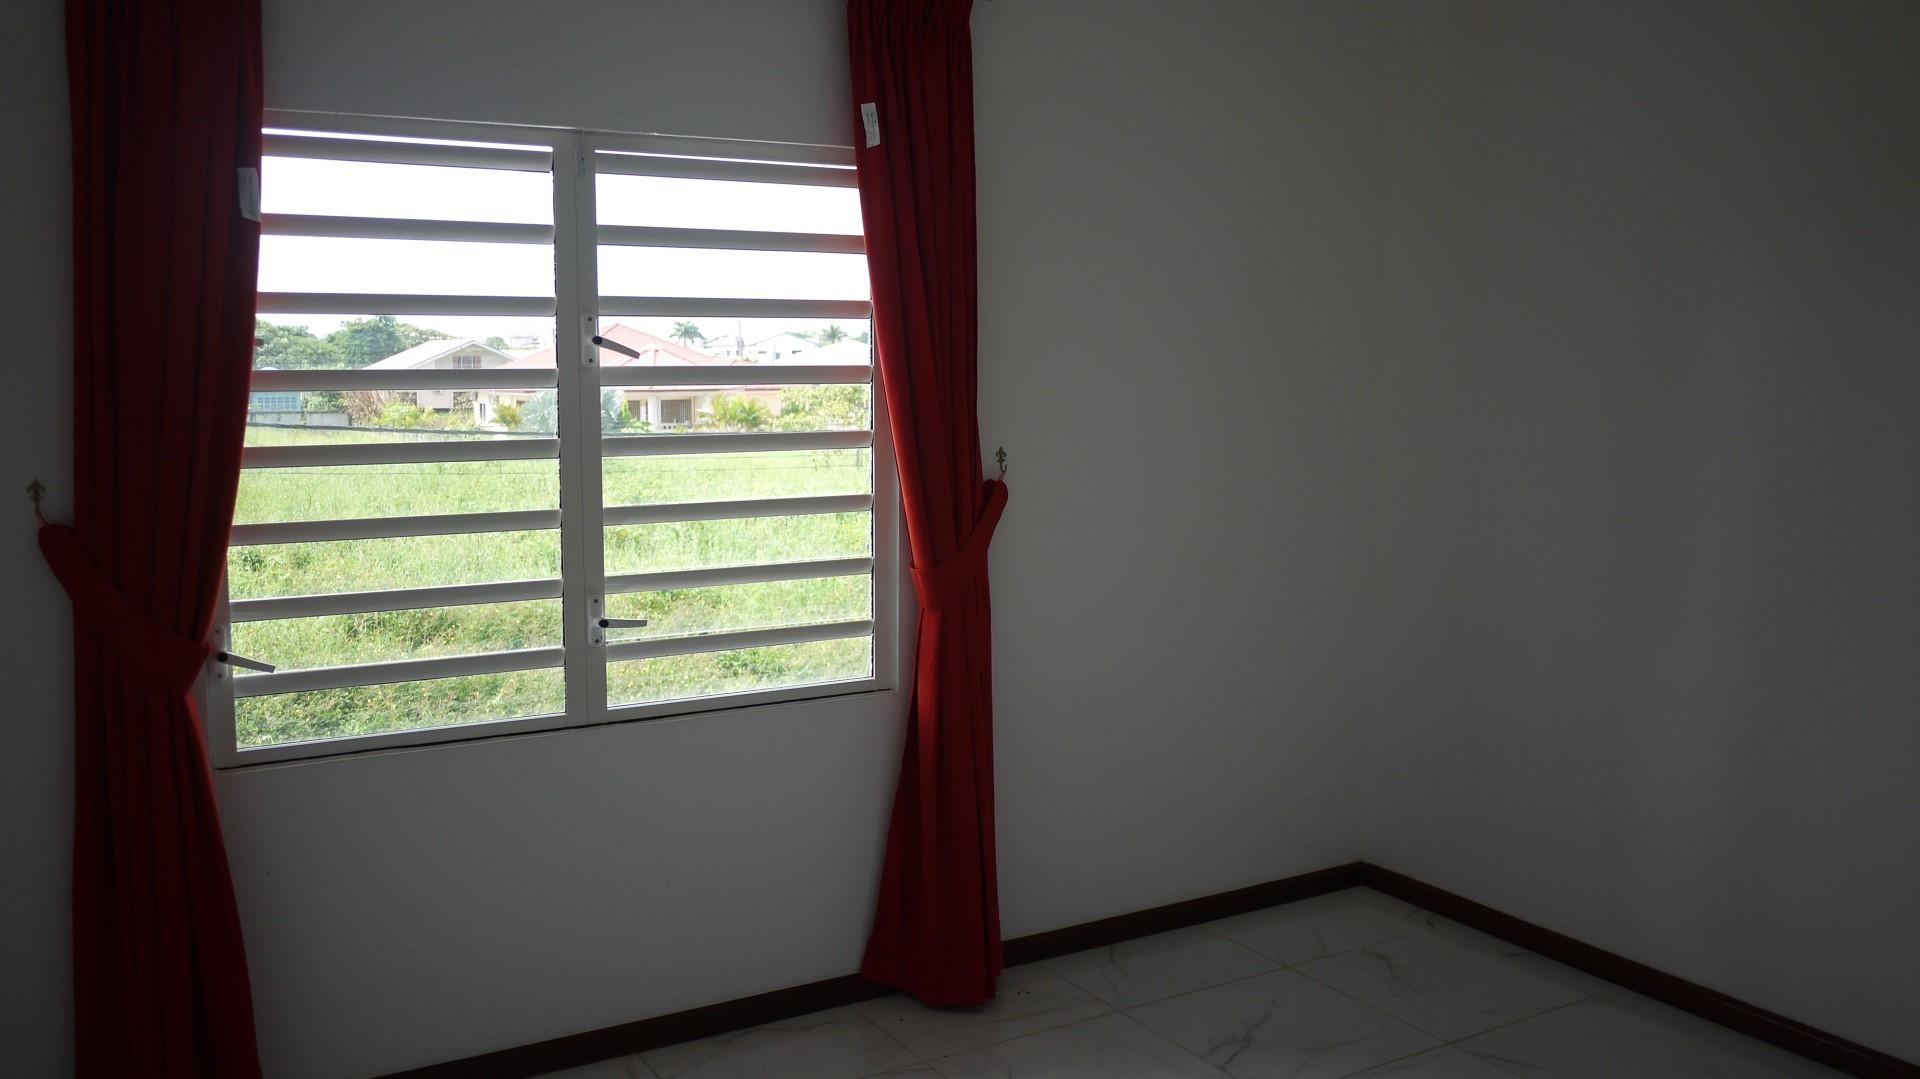 Gansistraat-Morgenstond-Paramaribo-Suriname-Terzol-Vastgoed-s10